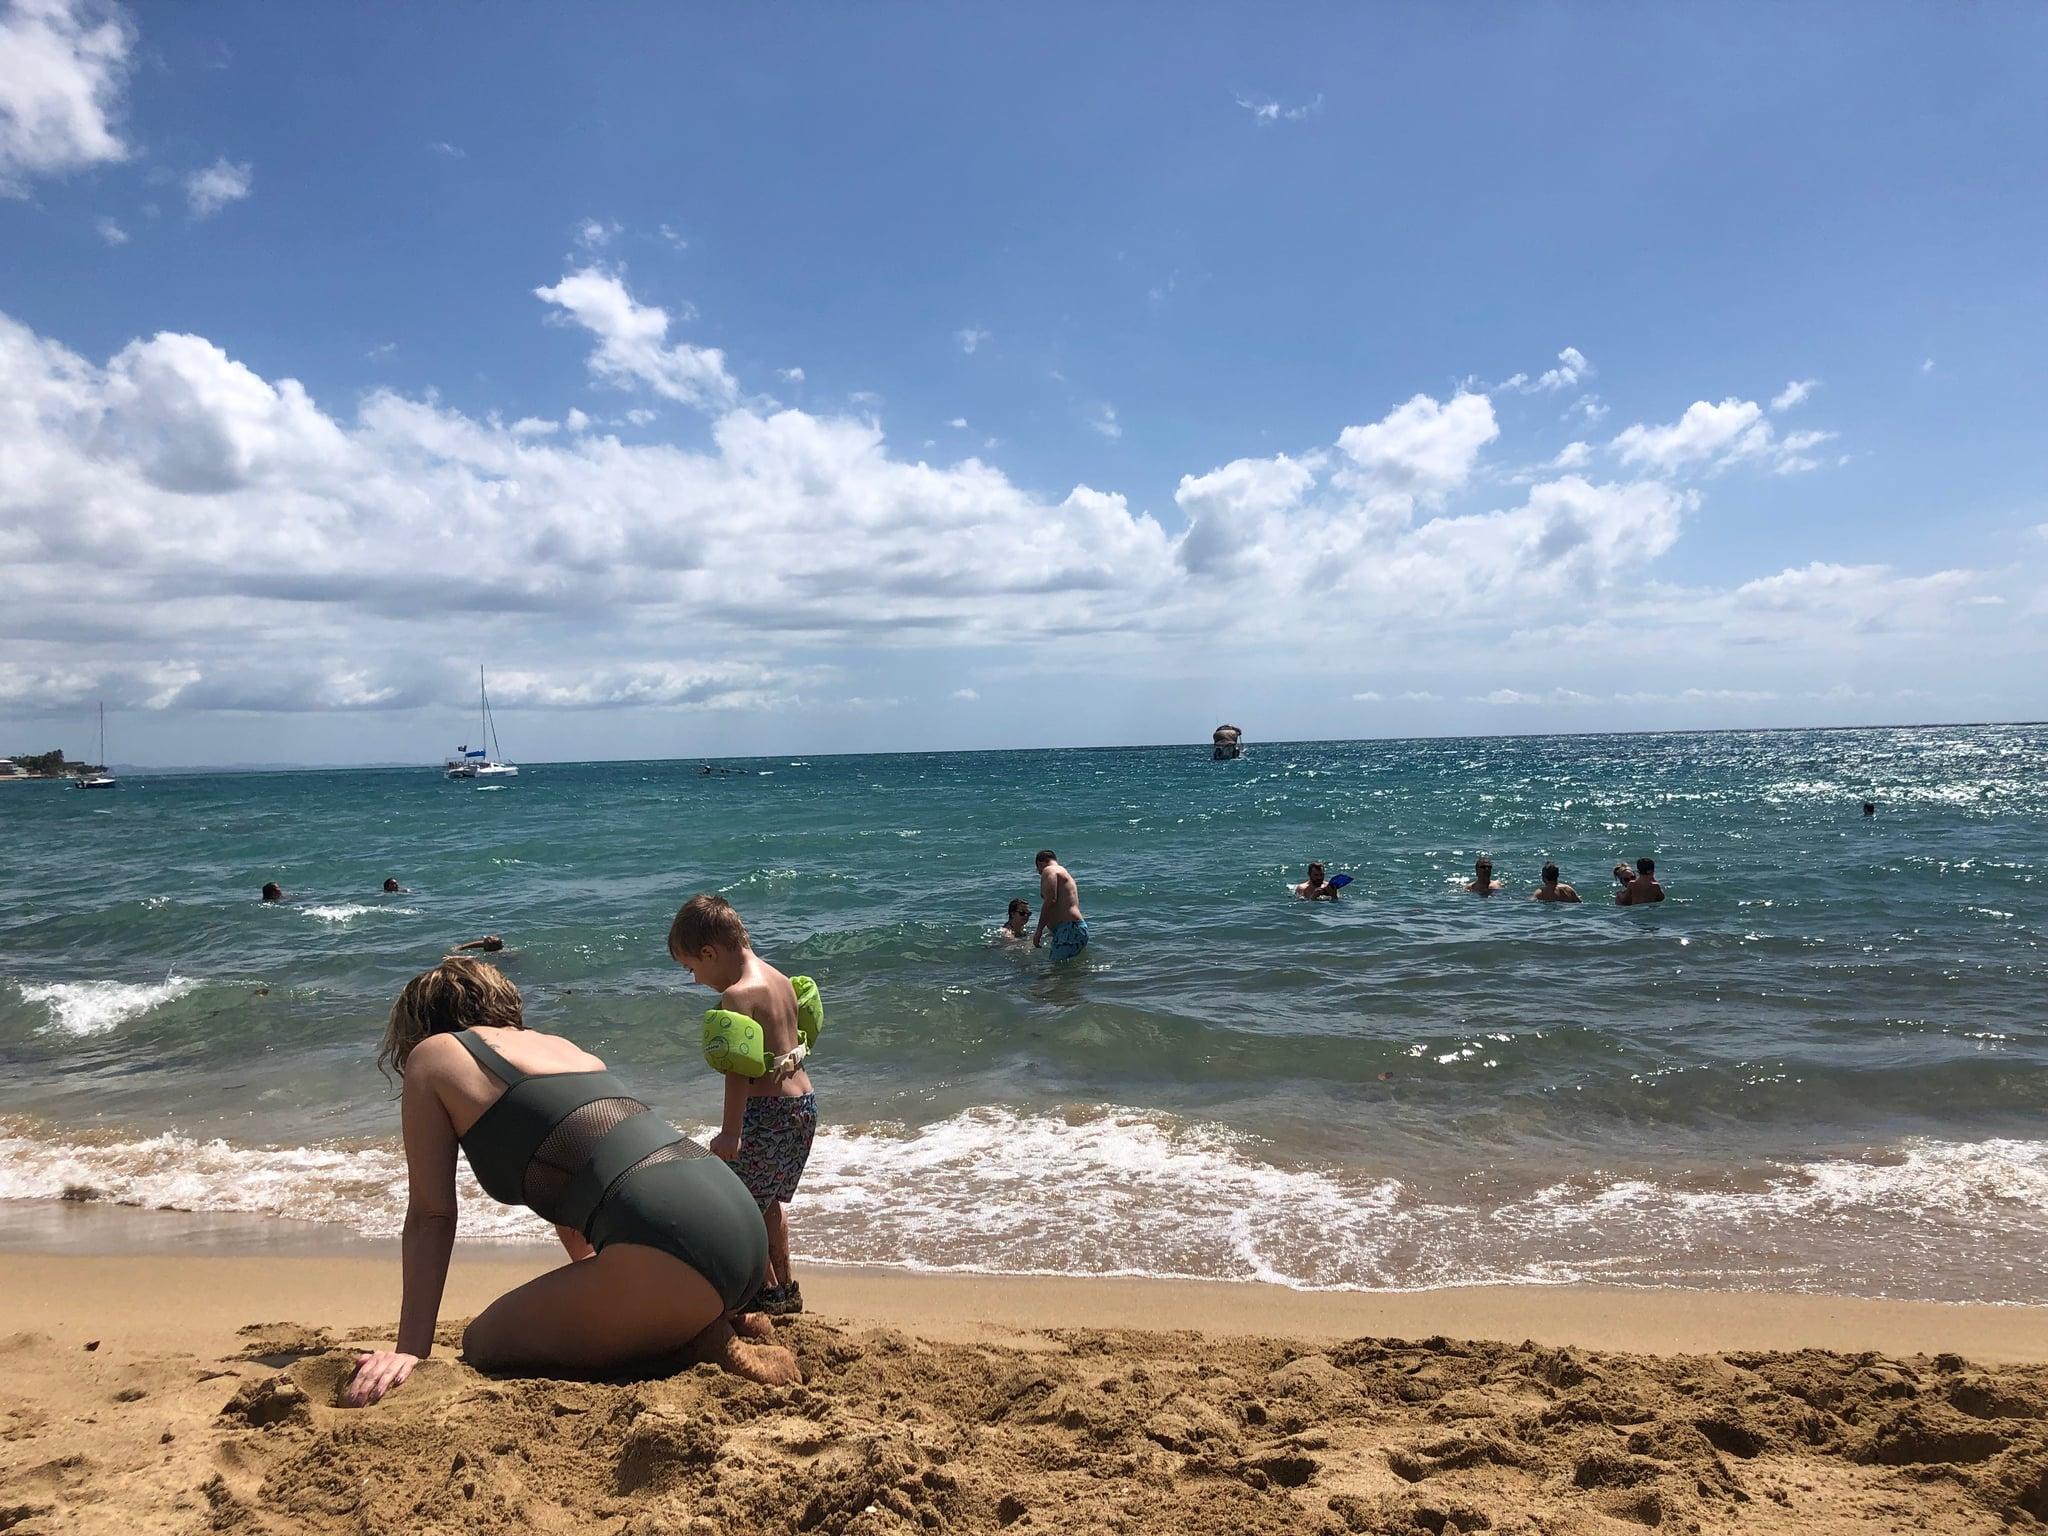 Mom on Beach with Grandson